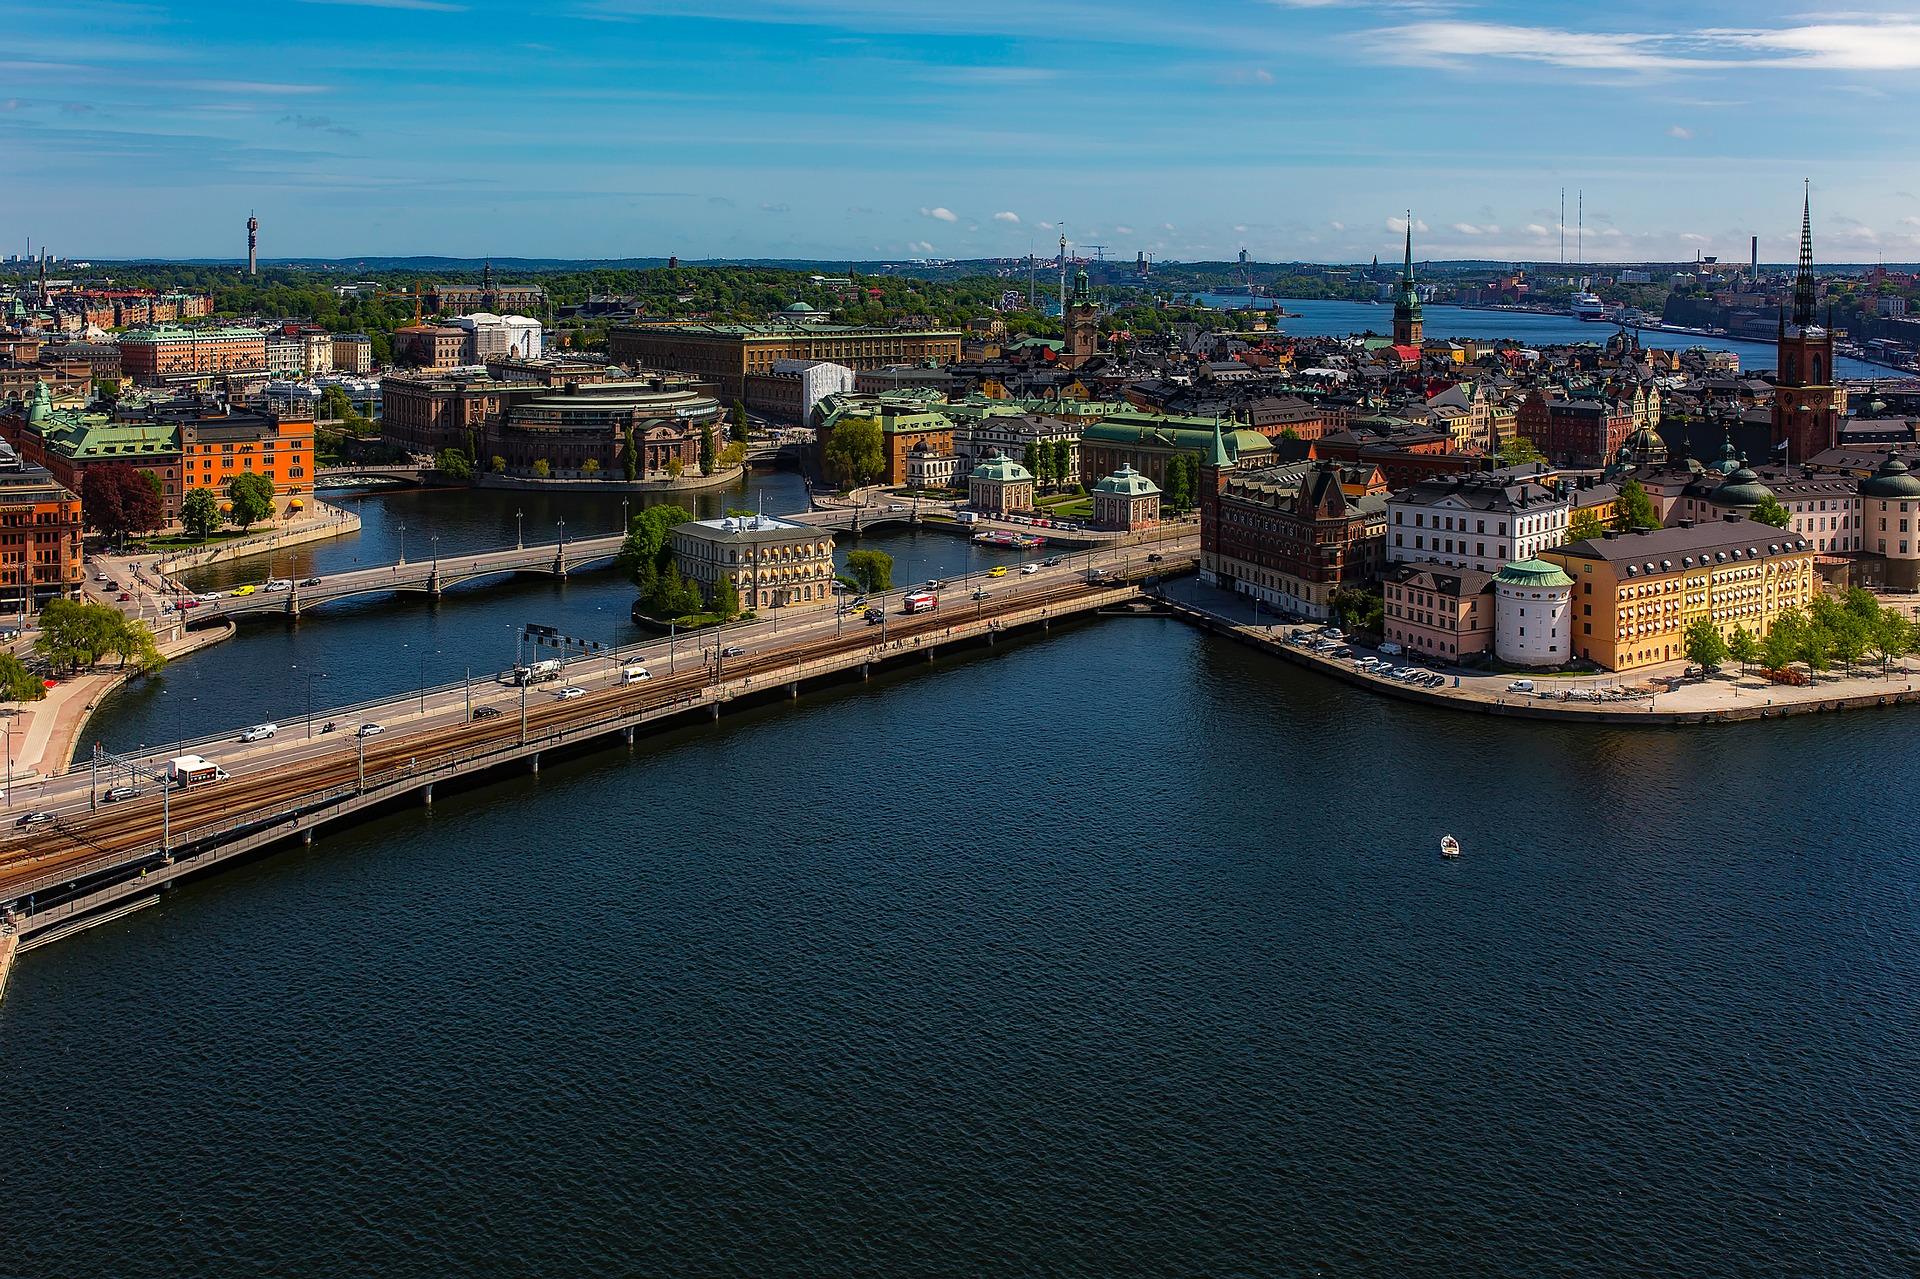 Private detectives and investigators in Sweden